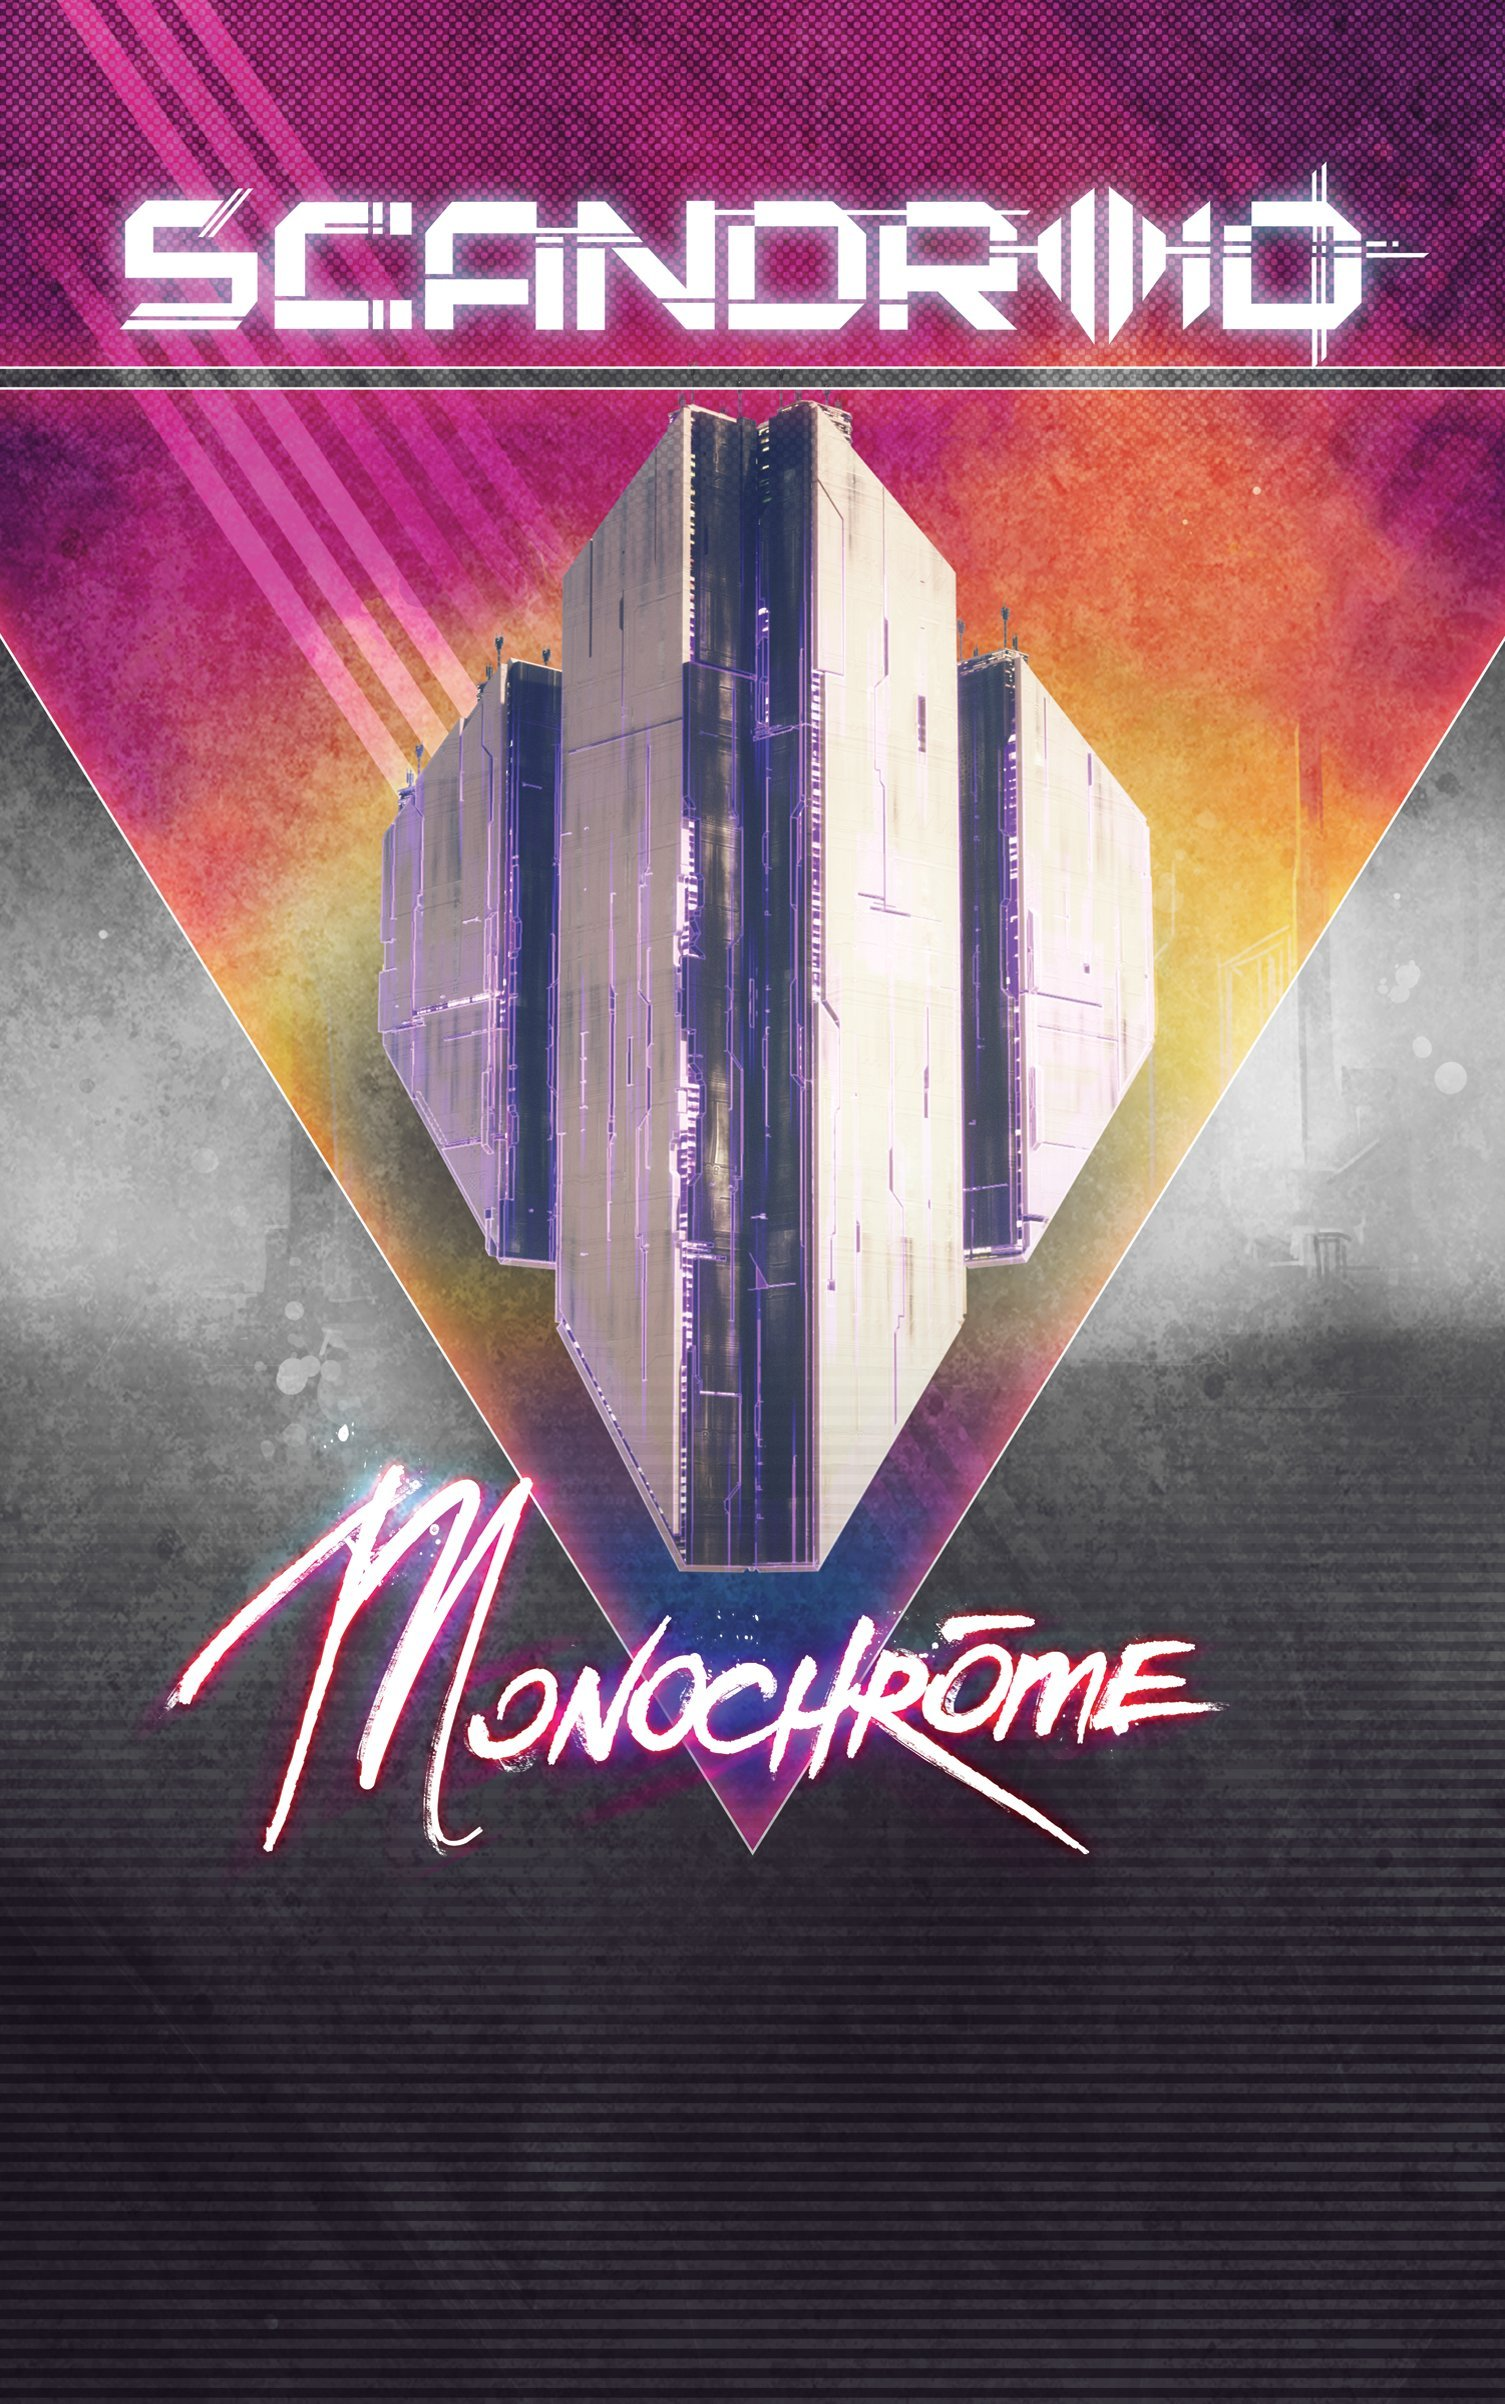 Cassette : SCANDROID - Monochrome (Cassette)